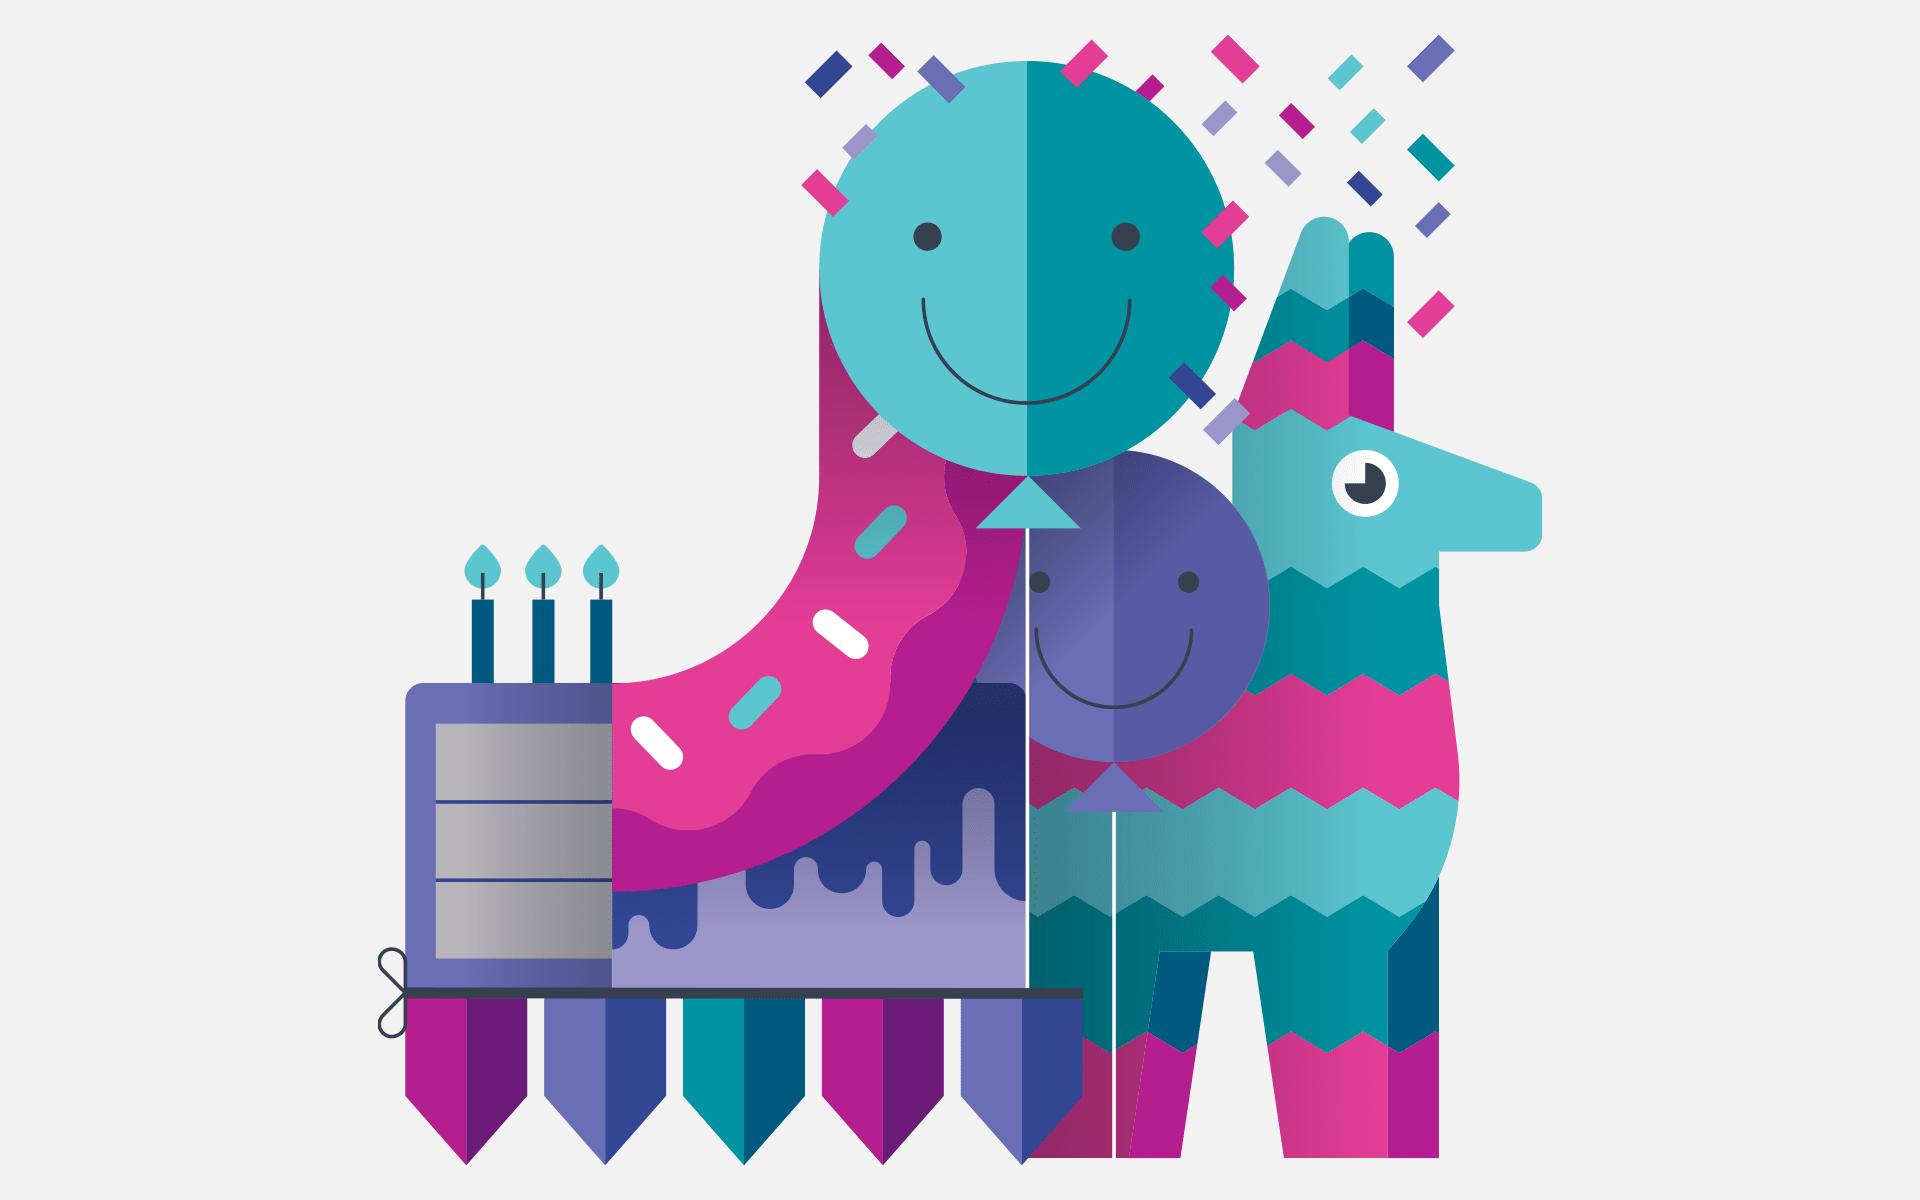 Bunjil-Birthday-Illustration-10